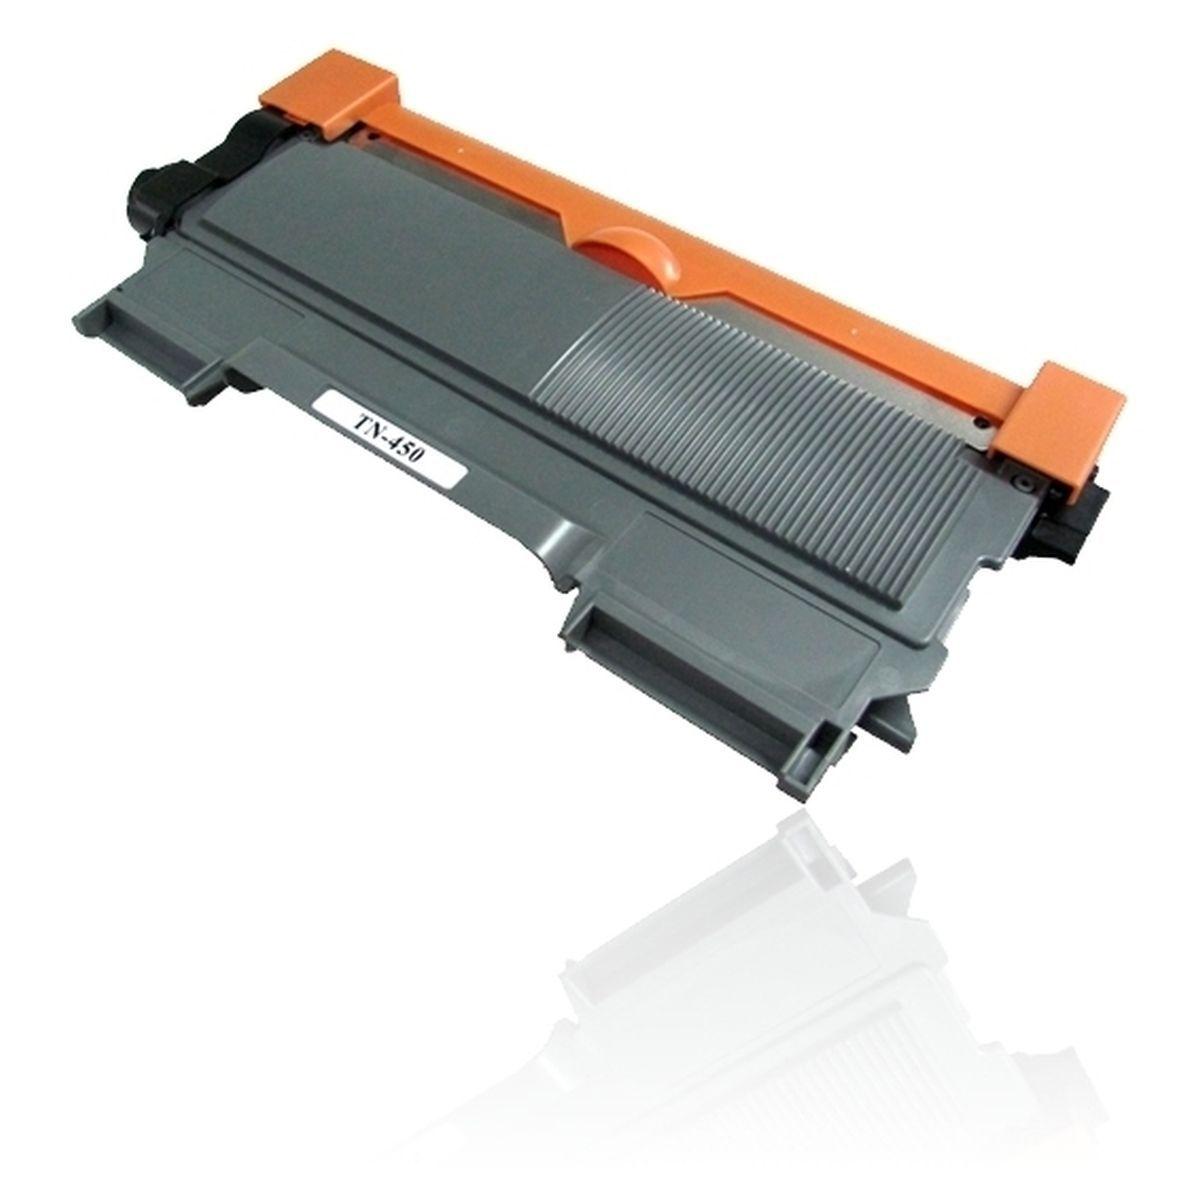 Toner Compatível com Brother TN450 TN410 TN420 2.600 Páginas - Cartucho & Cia